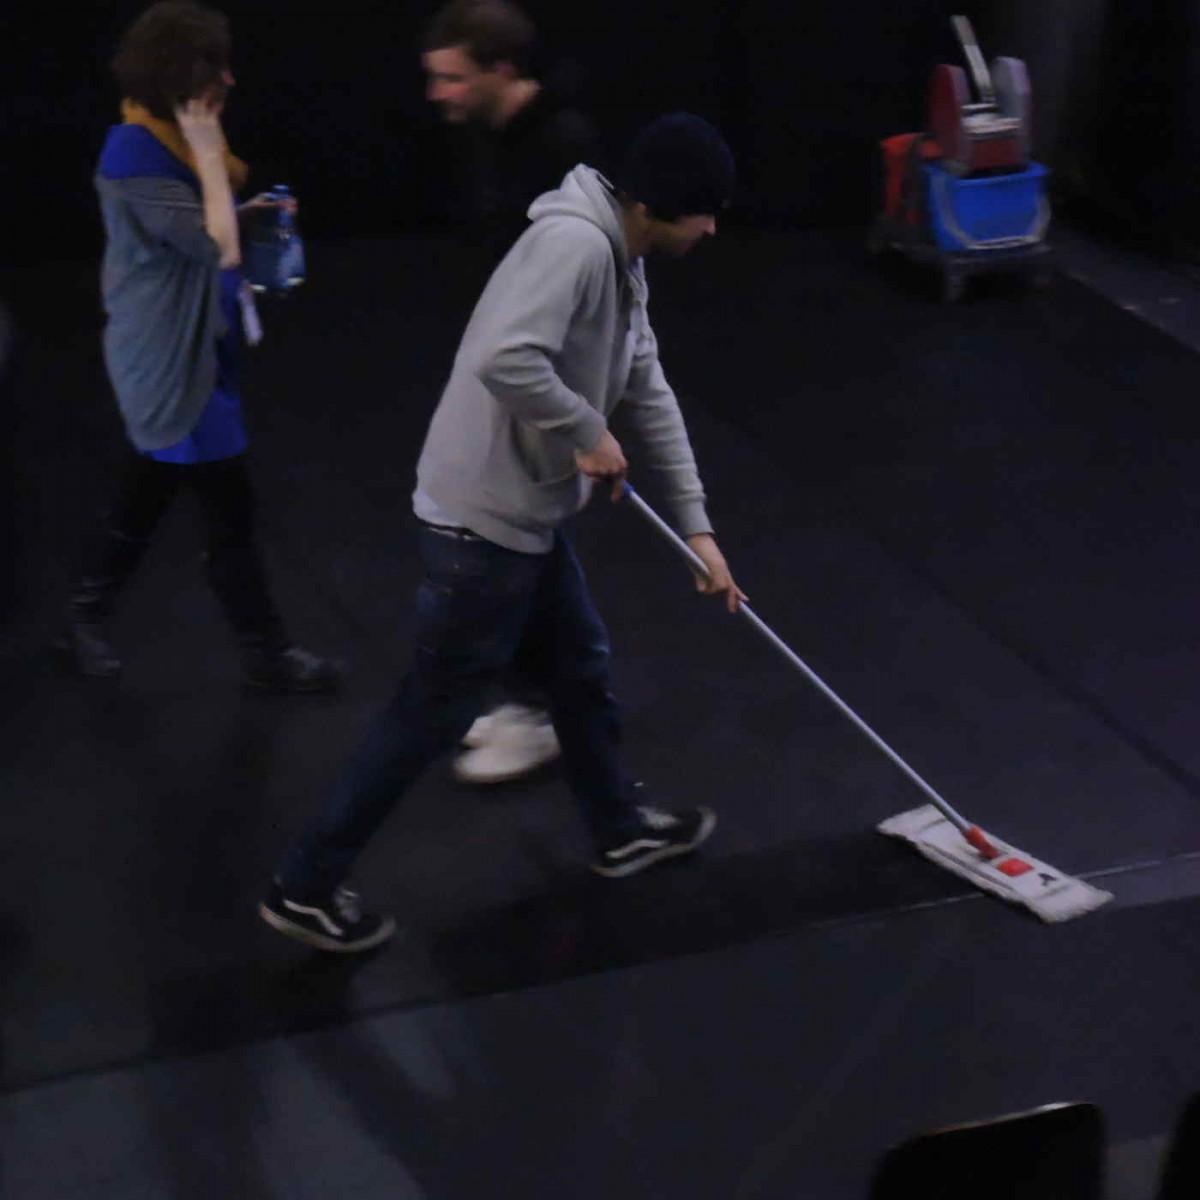 Hebbel am Ufer - Vorbereitungen Berlinale Talents